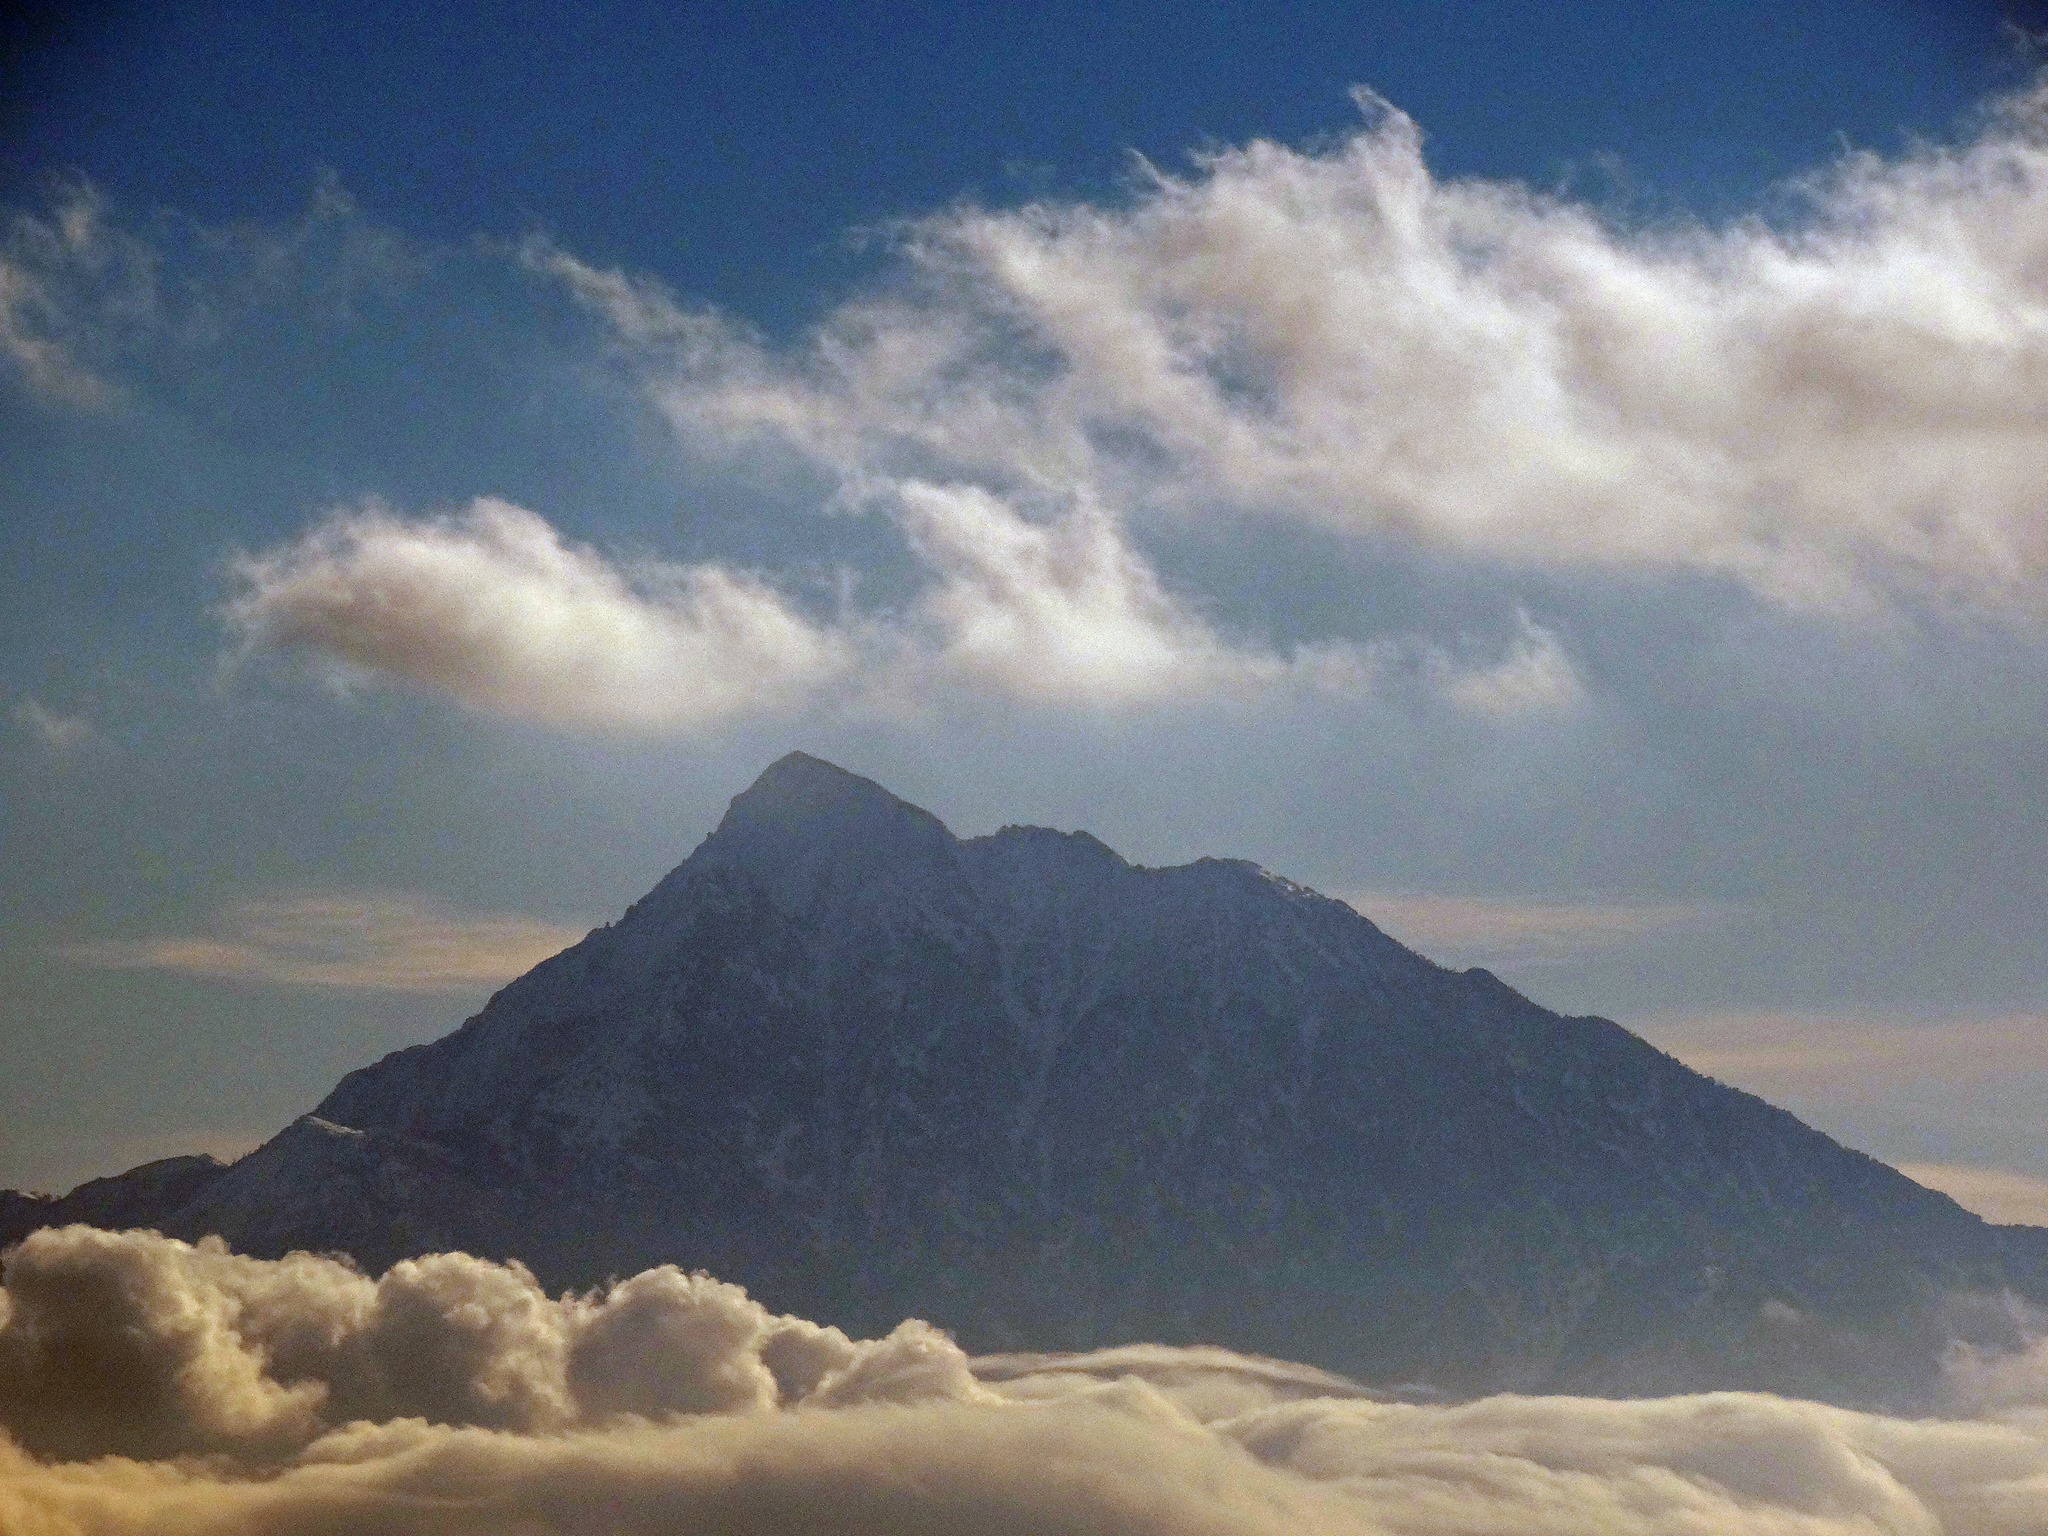 връх Атон над облаците